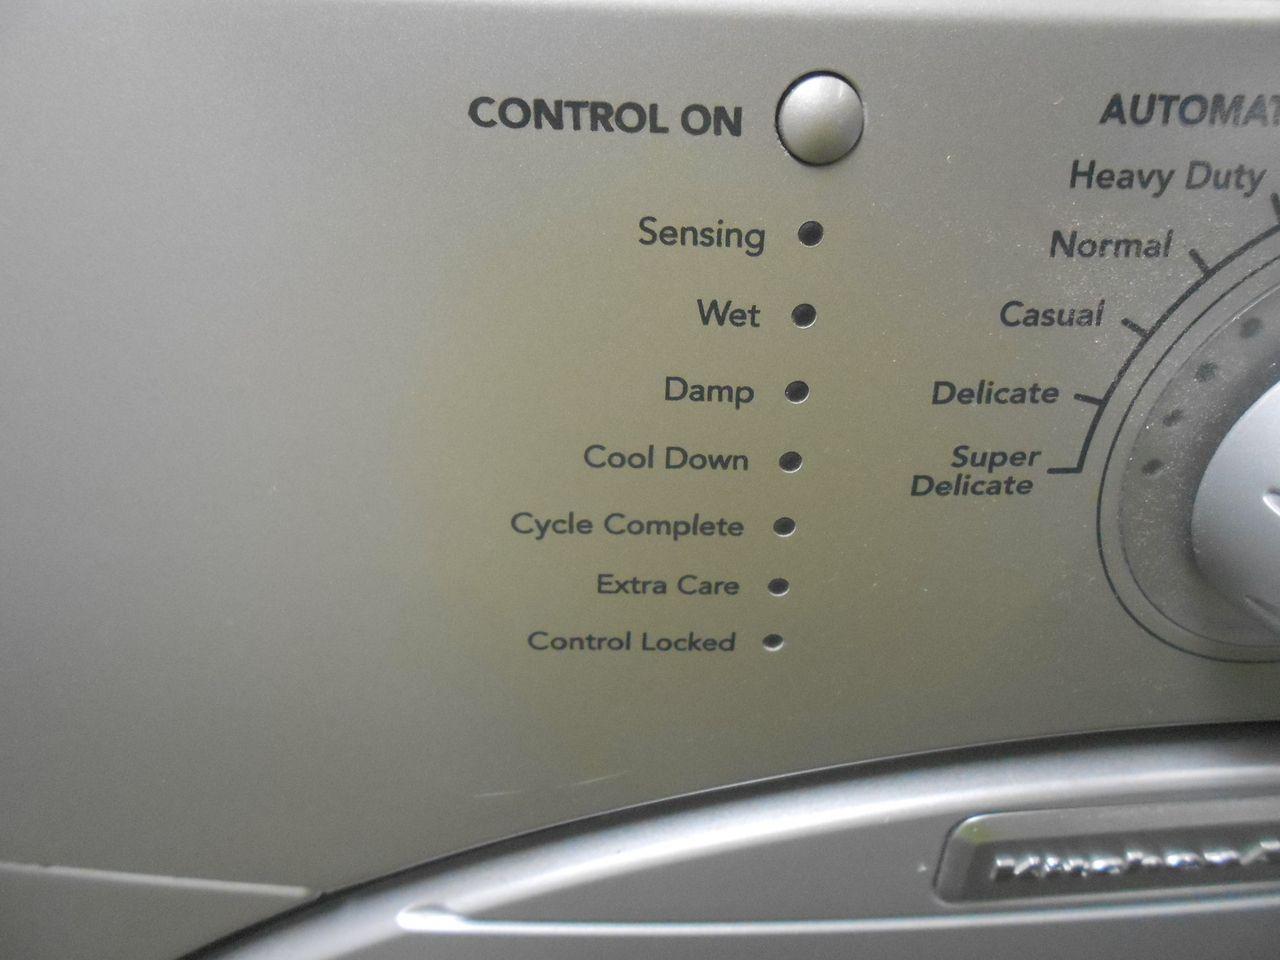 kitchenaid electric stove top manual